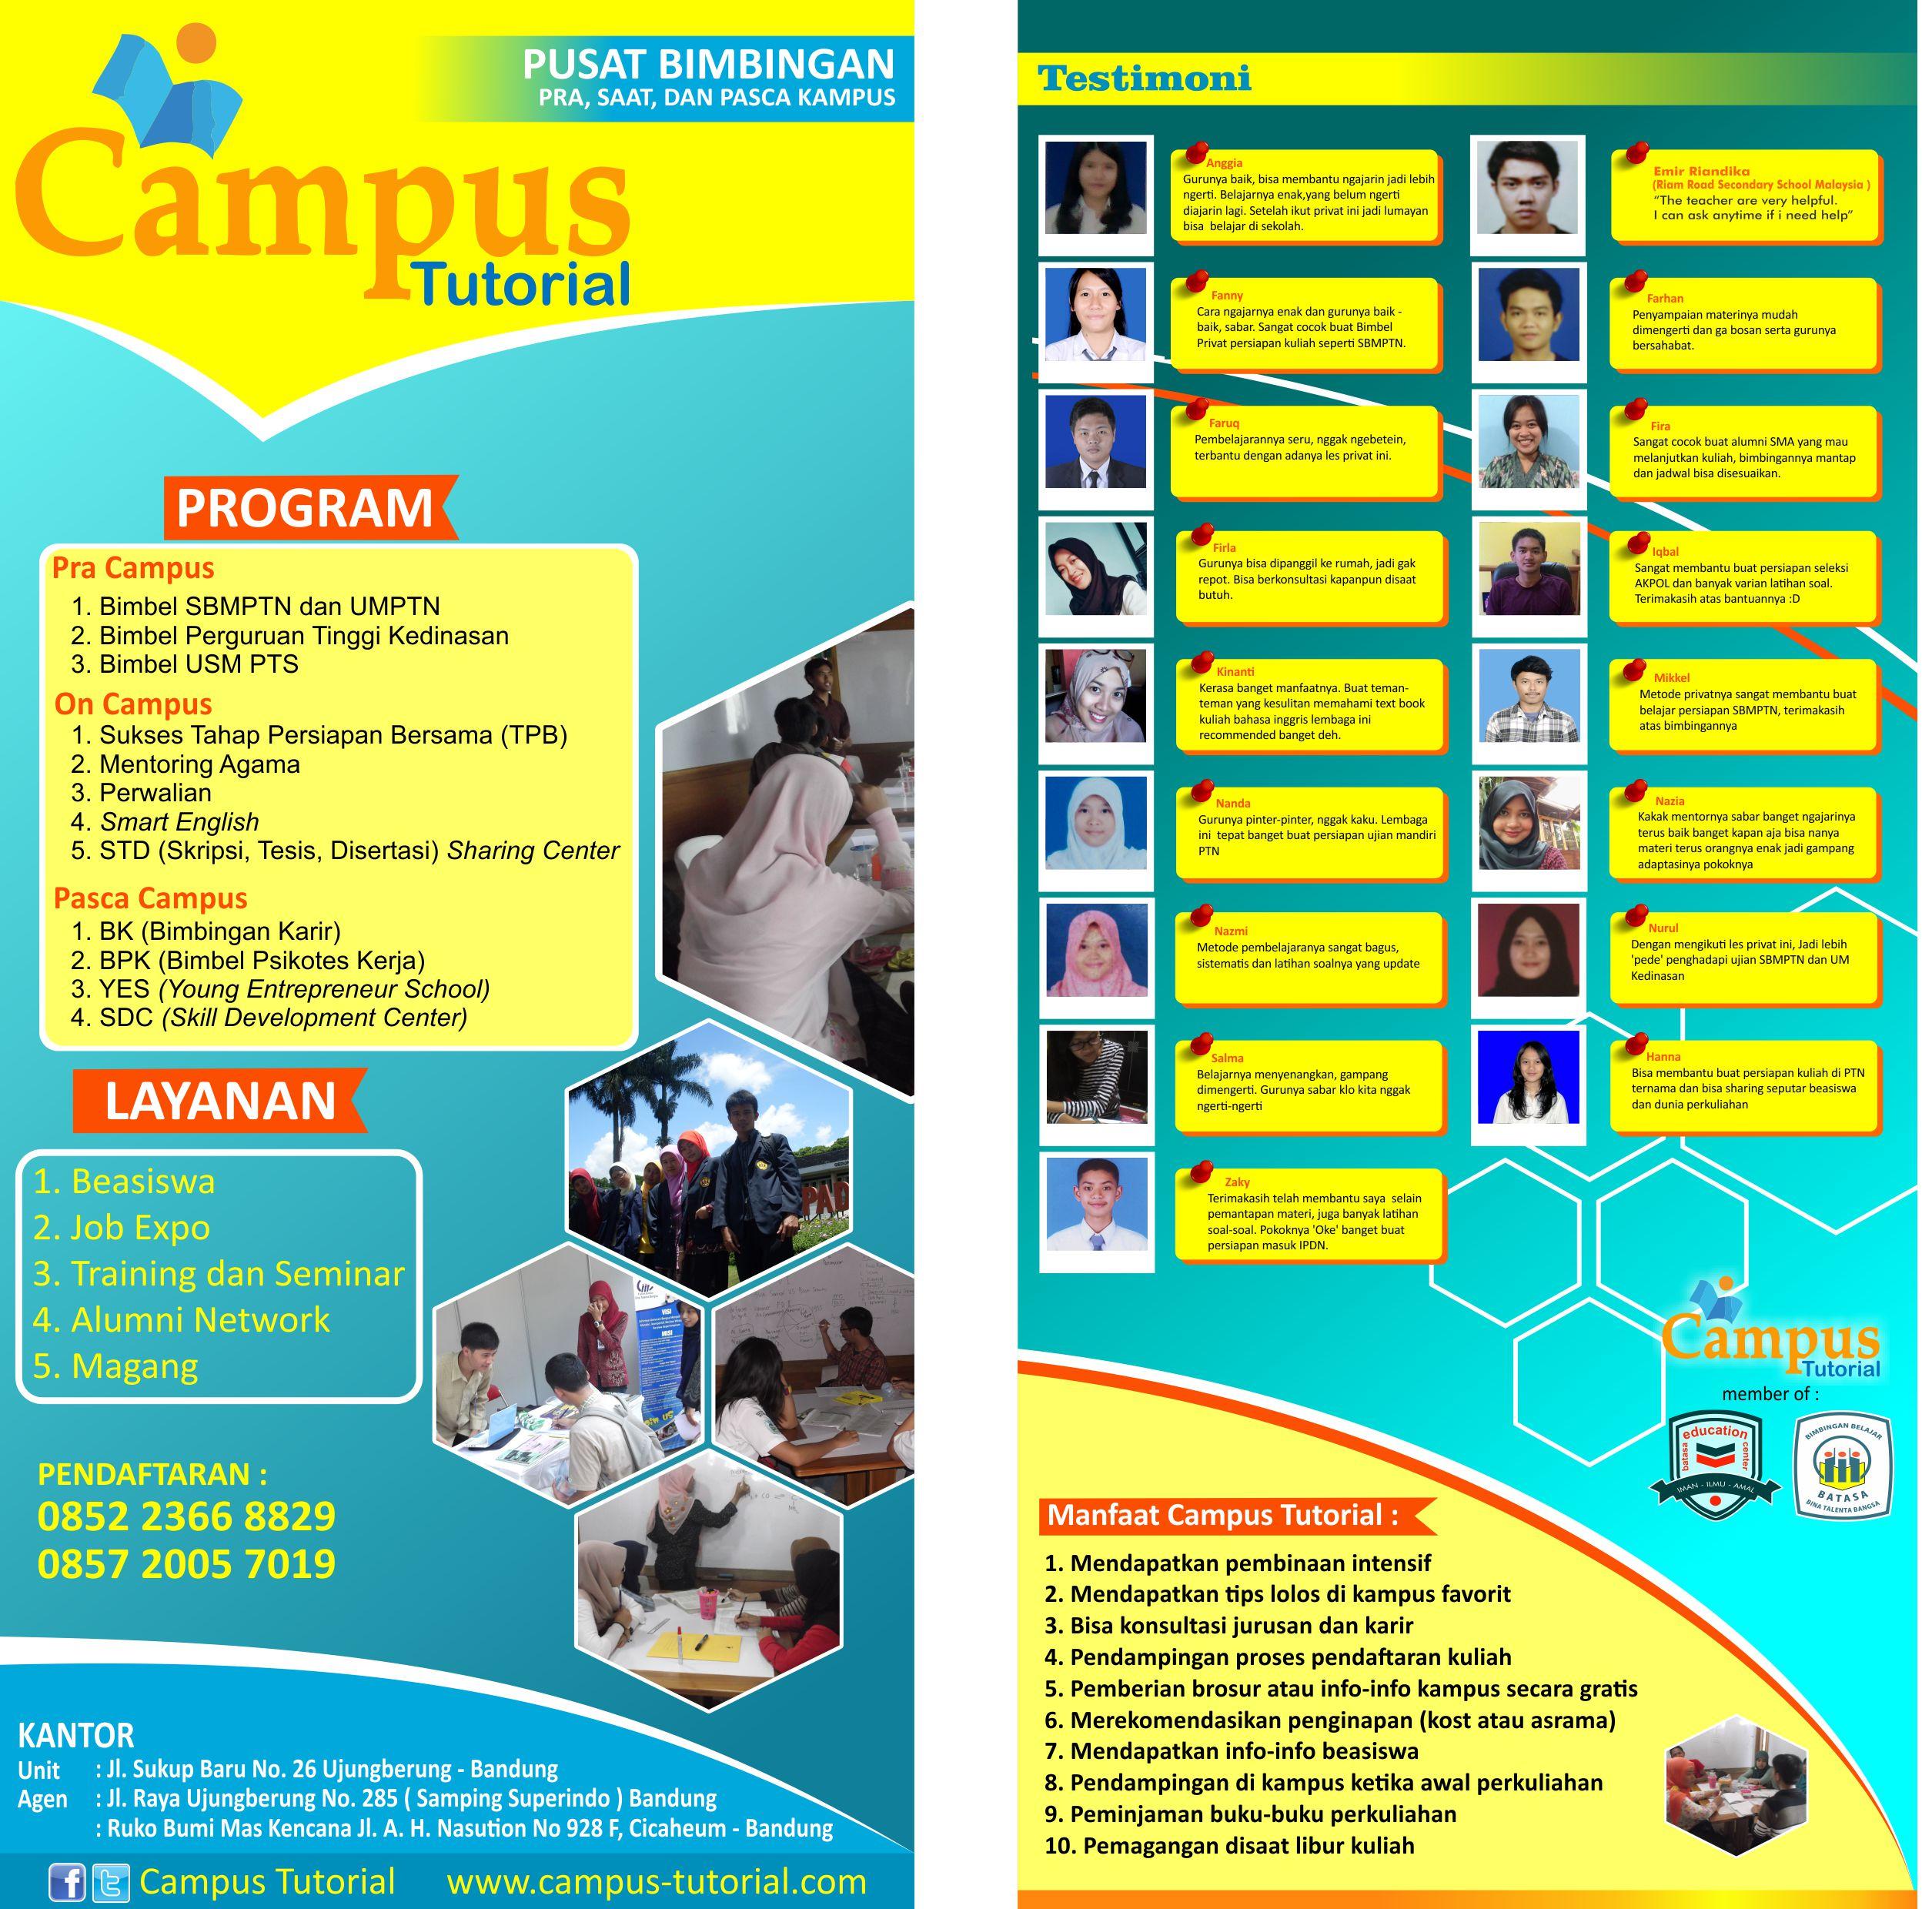 Pendaftaran Siswa Baru Bimbel Batasa 2017 2018 Tk Sd Smp Sma